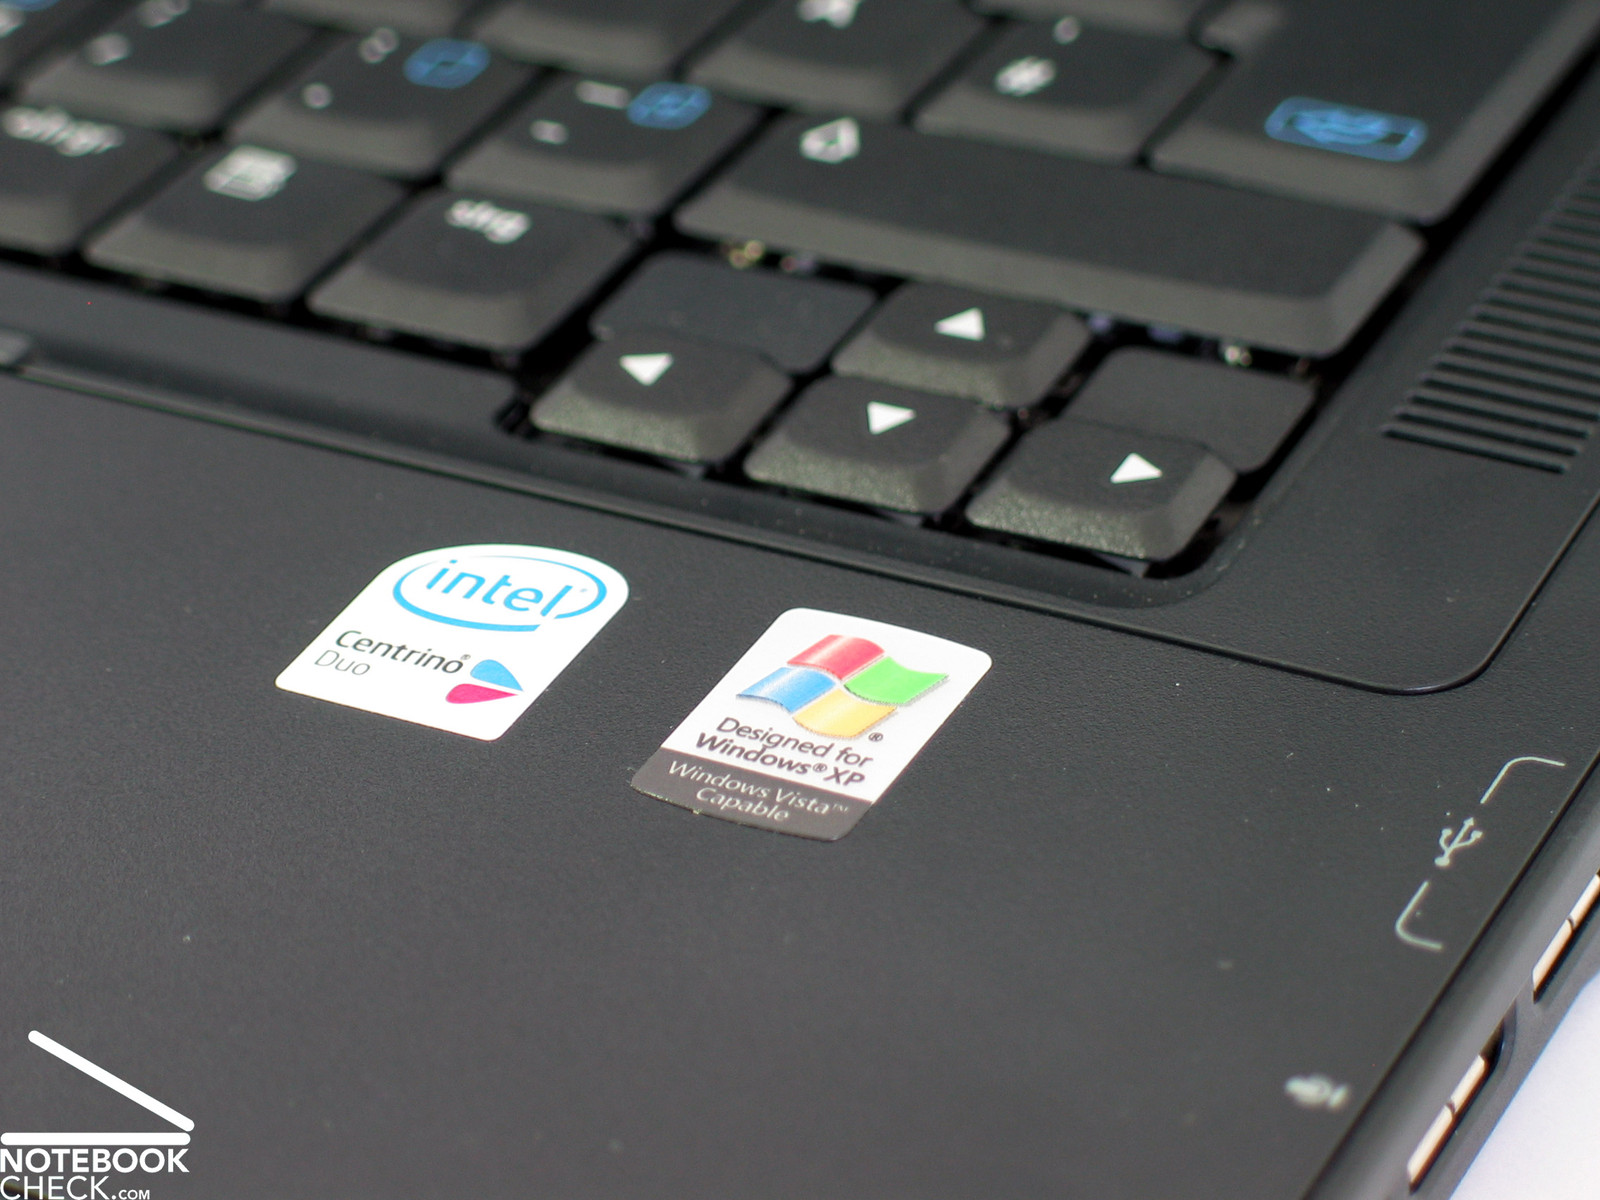 HP Compaq nx Notebook PC